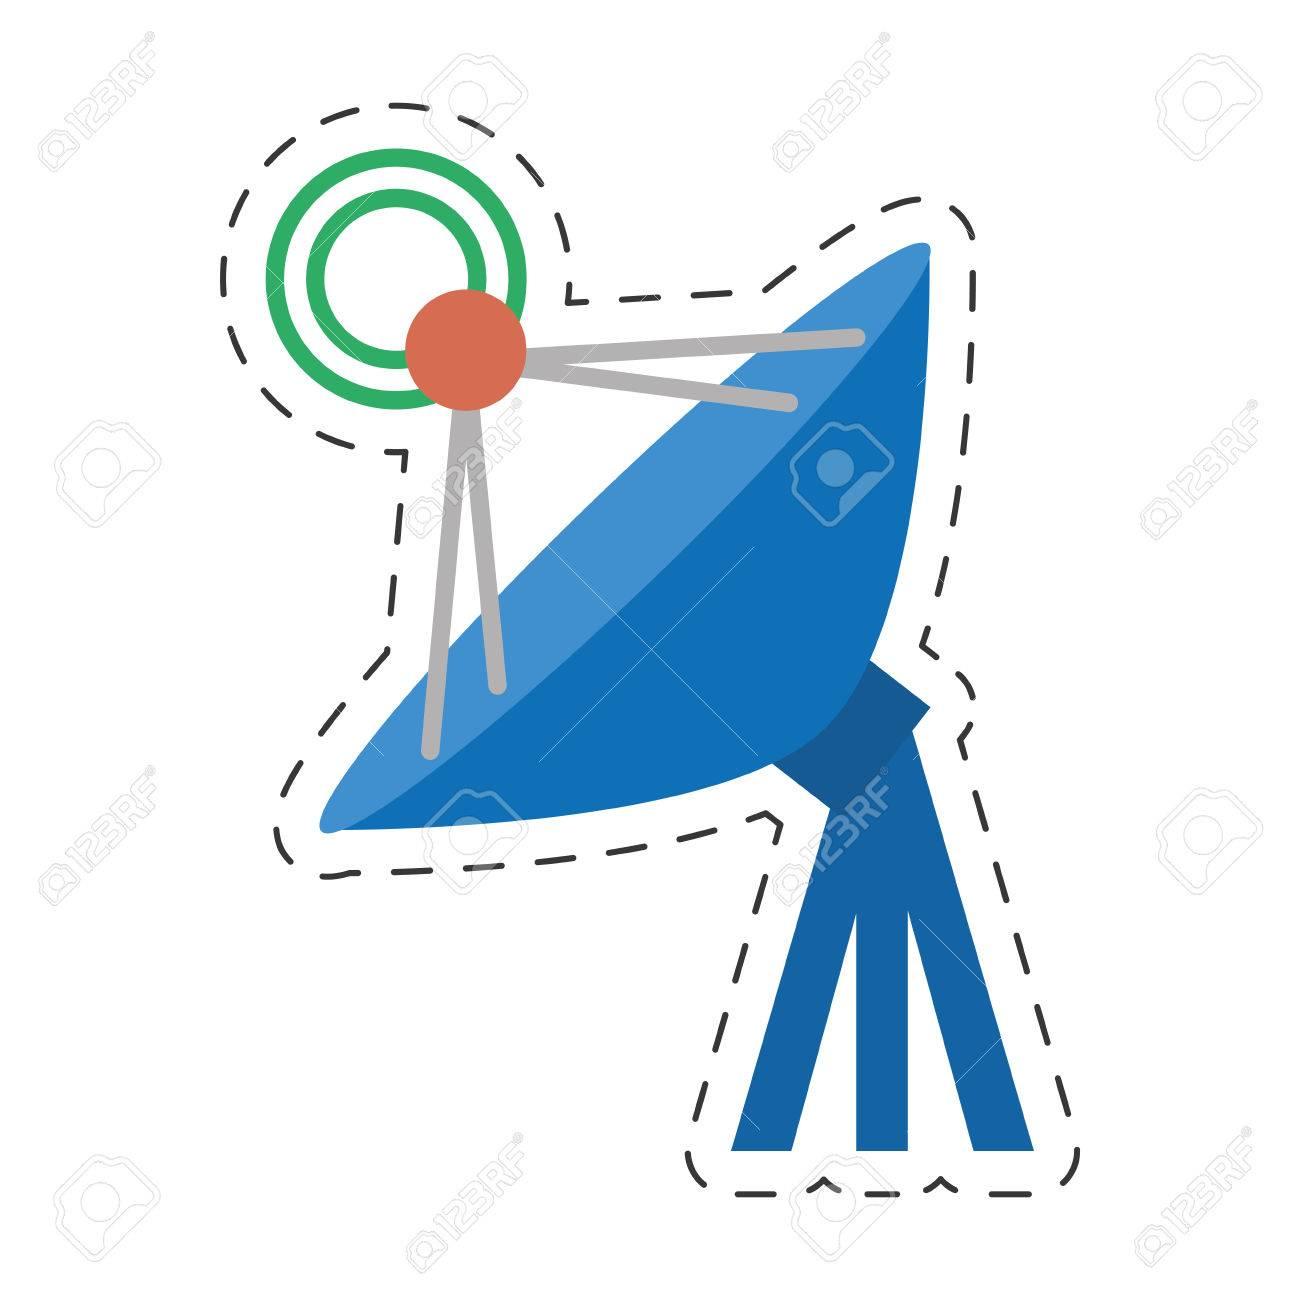 Antenna Dish Radar Technology Internet Vector Illustration Eps